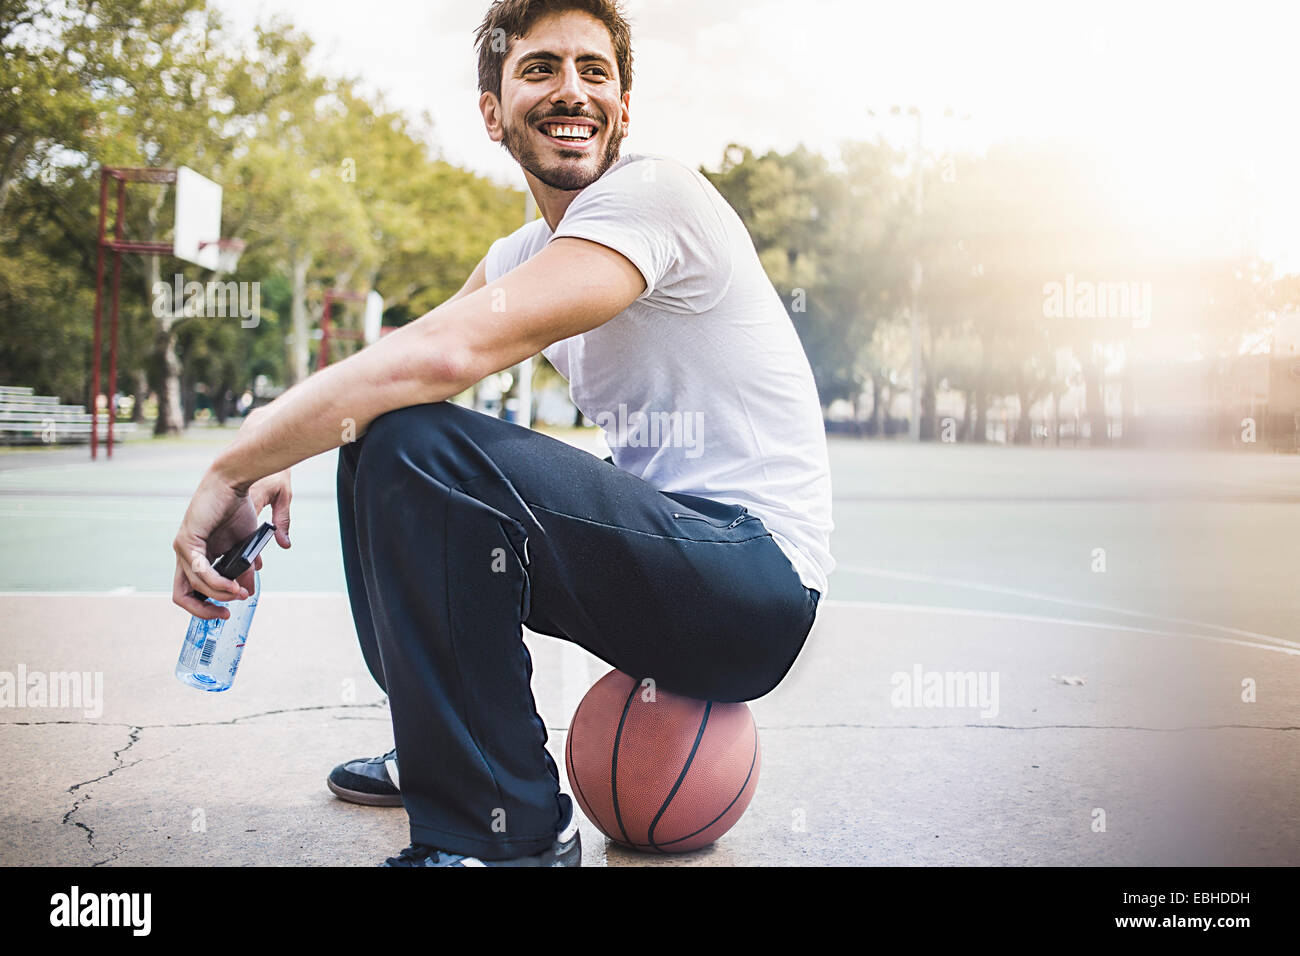 Retrato de joven sentado en pelota de baloncesto Imagen De Stock